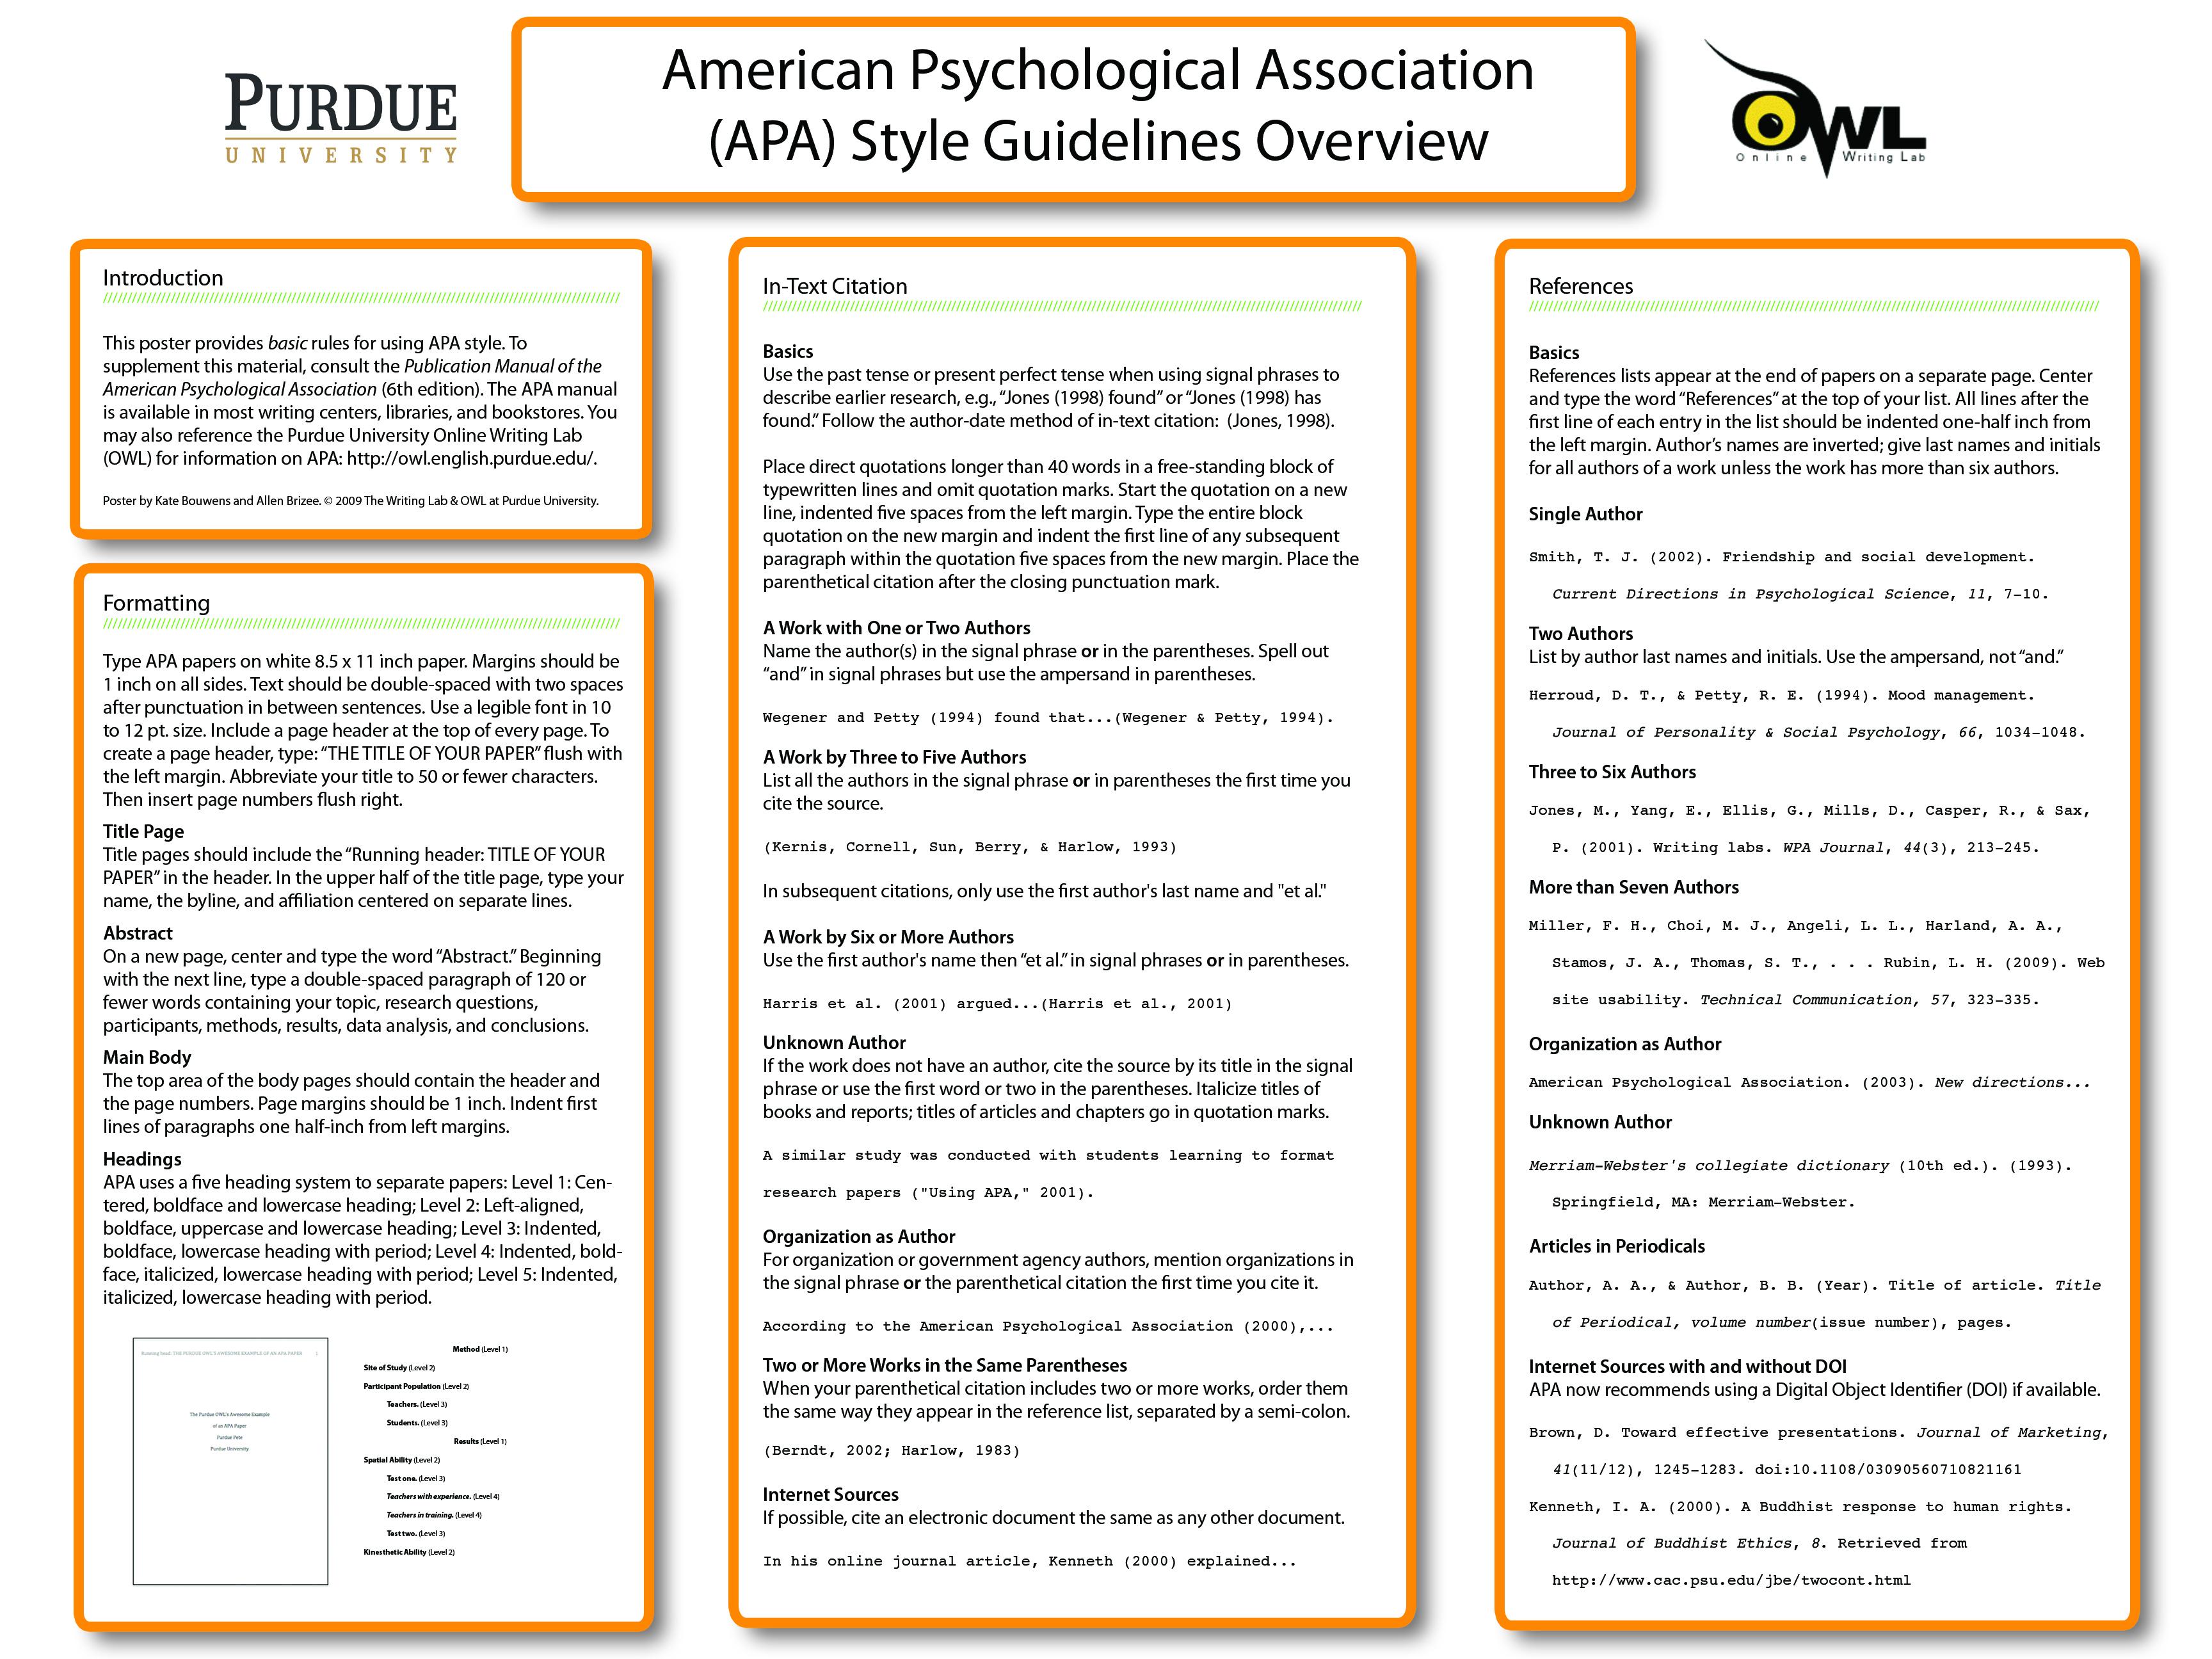 023 Essay Example Purdue Beautiful University Writing Owl Formal Format Paper Full